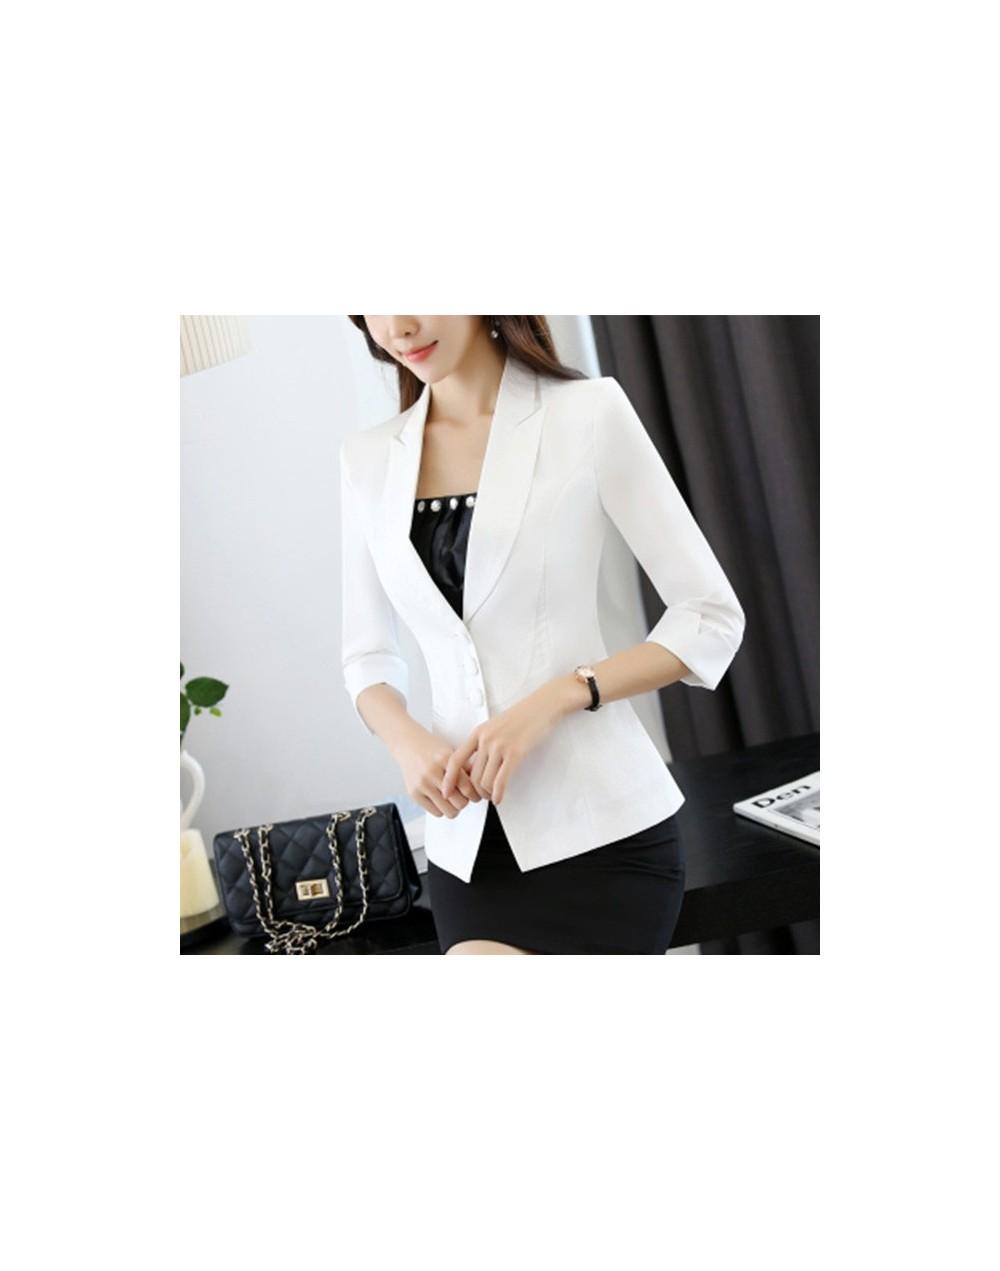 Blazer Women Black White Long Sleeve Blazers Single-Breasted Small Suit Jacket Coat Women Office Ladies Jacket Female Tops C...